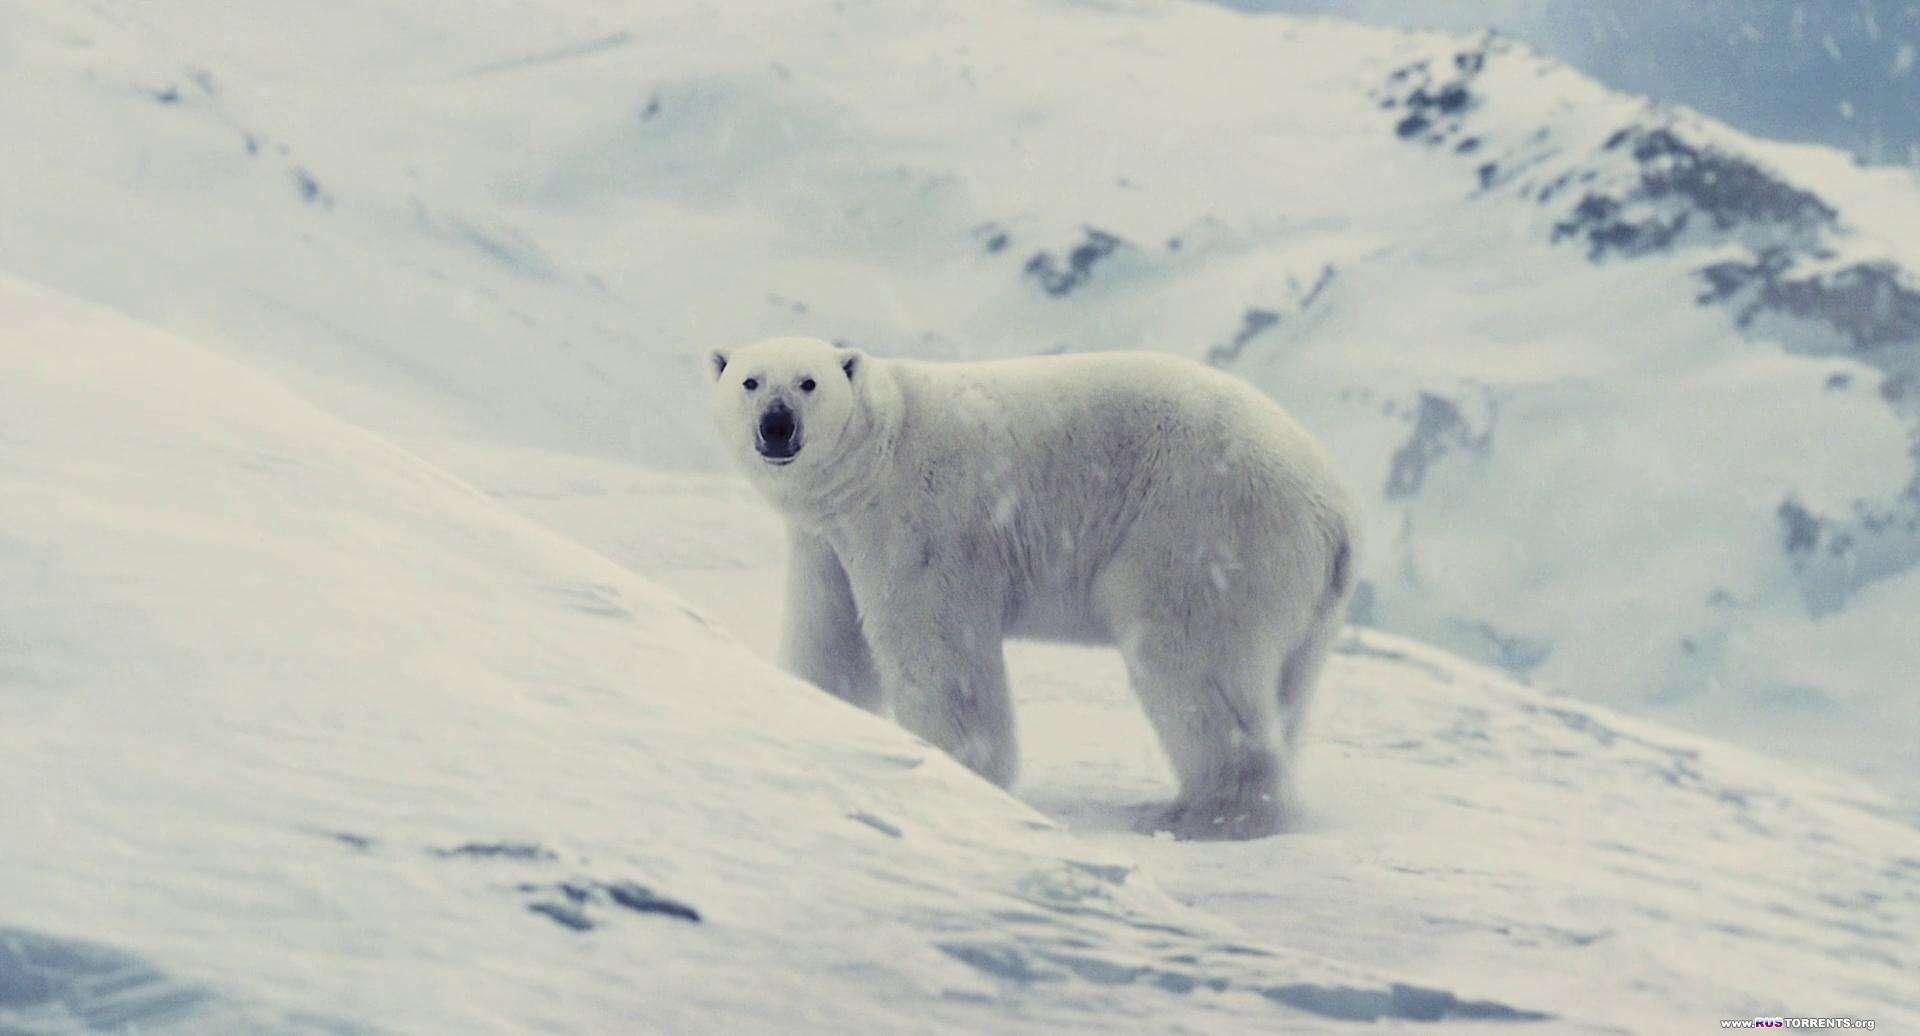 Сквозь снег | BDRip 1080p | L2